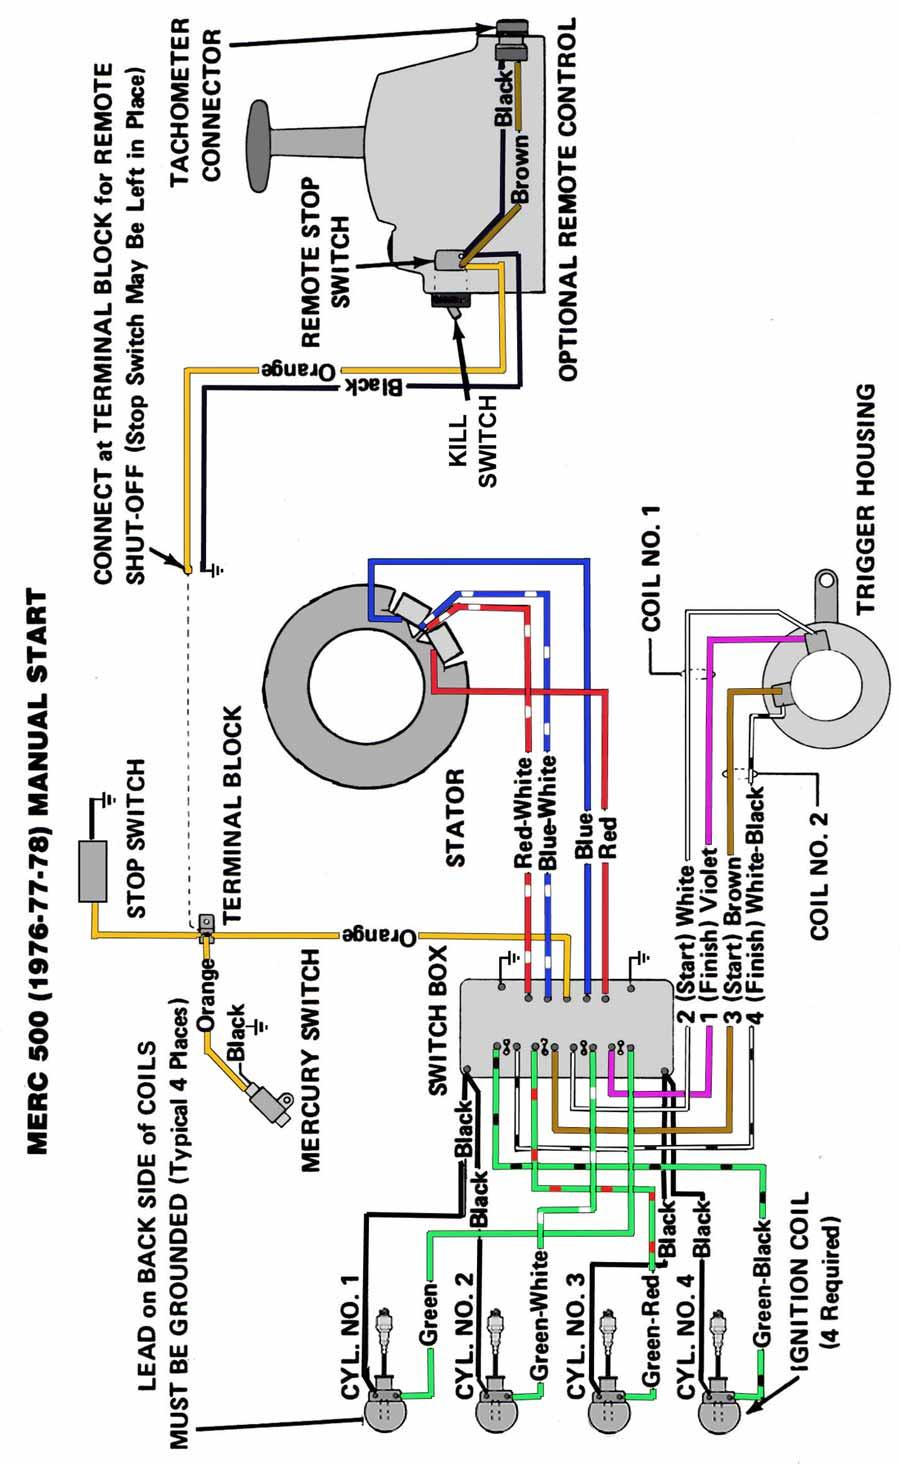 125 hp mercury outboard wiring diagram